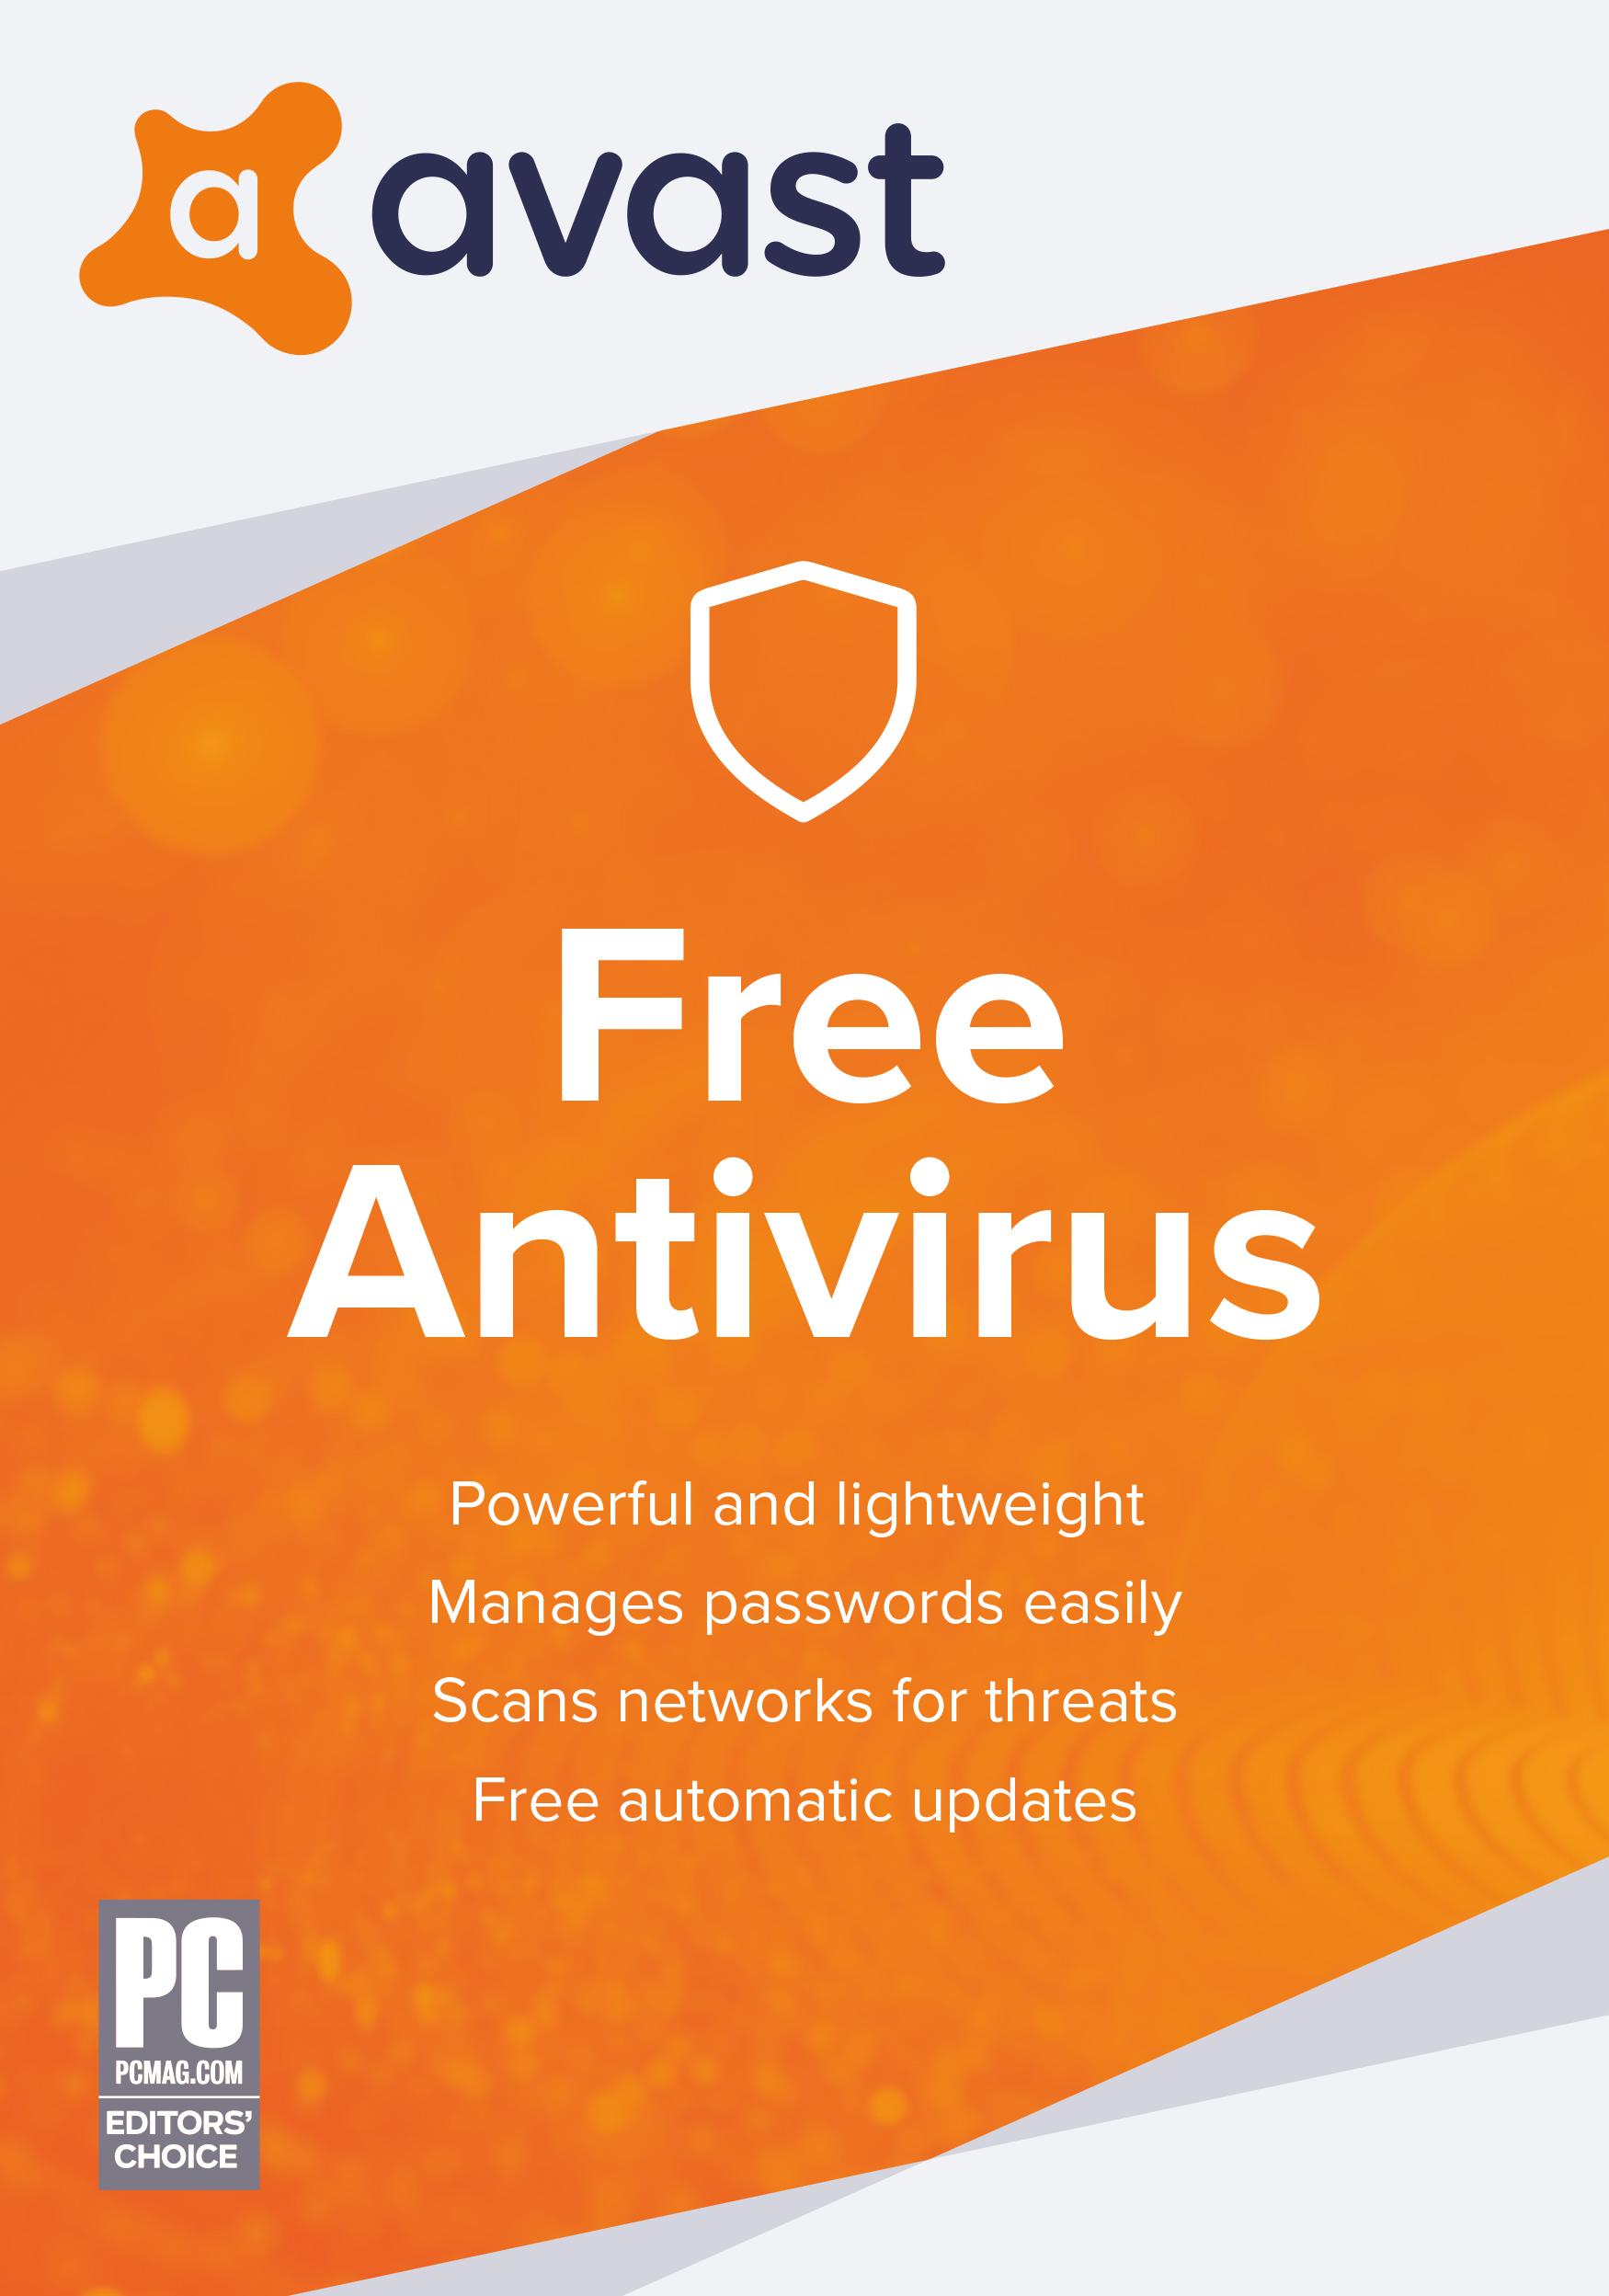 Avast Free Antivirus 2018 [Downl...